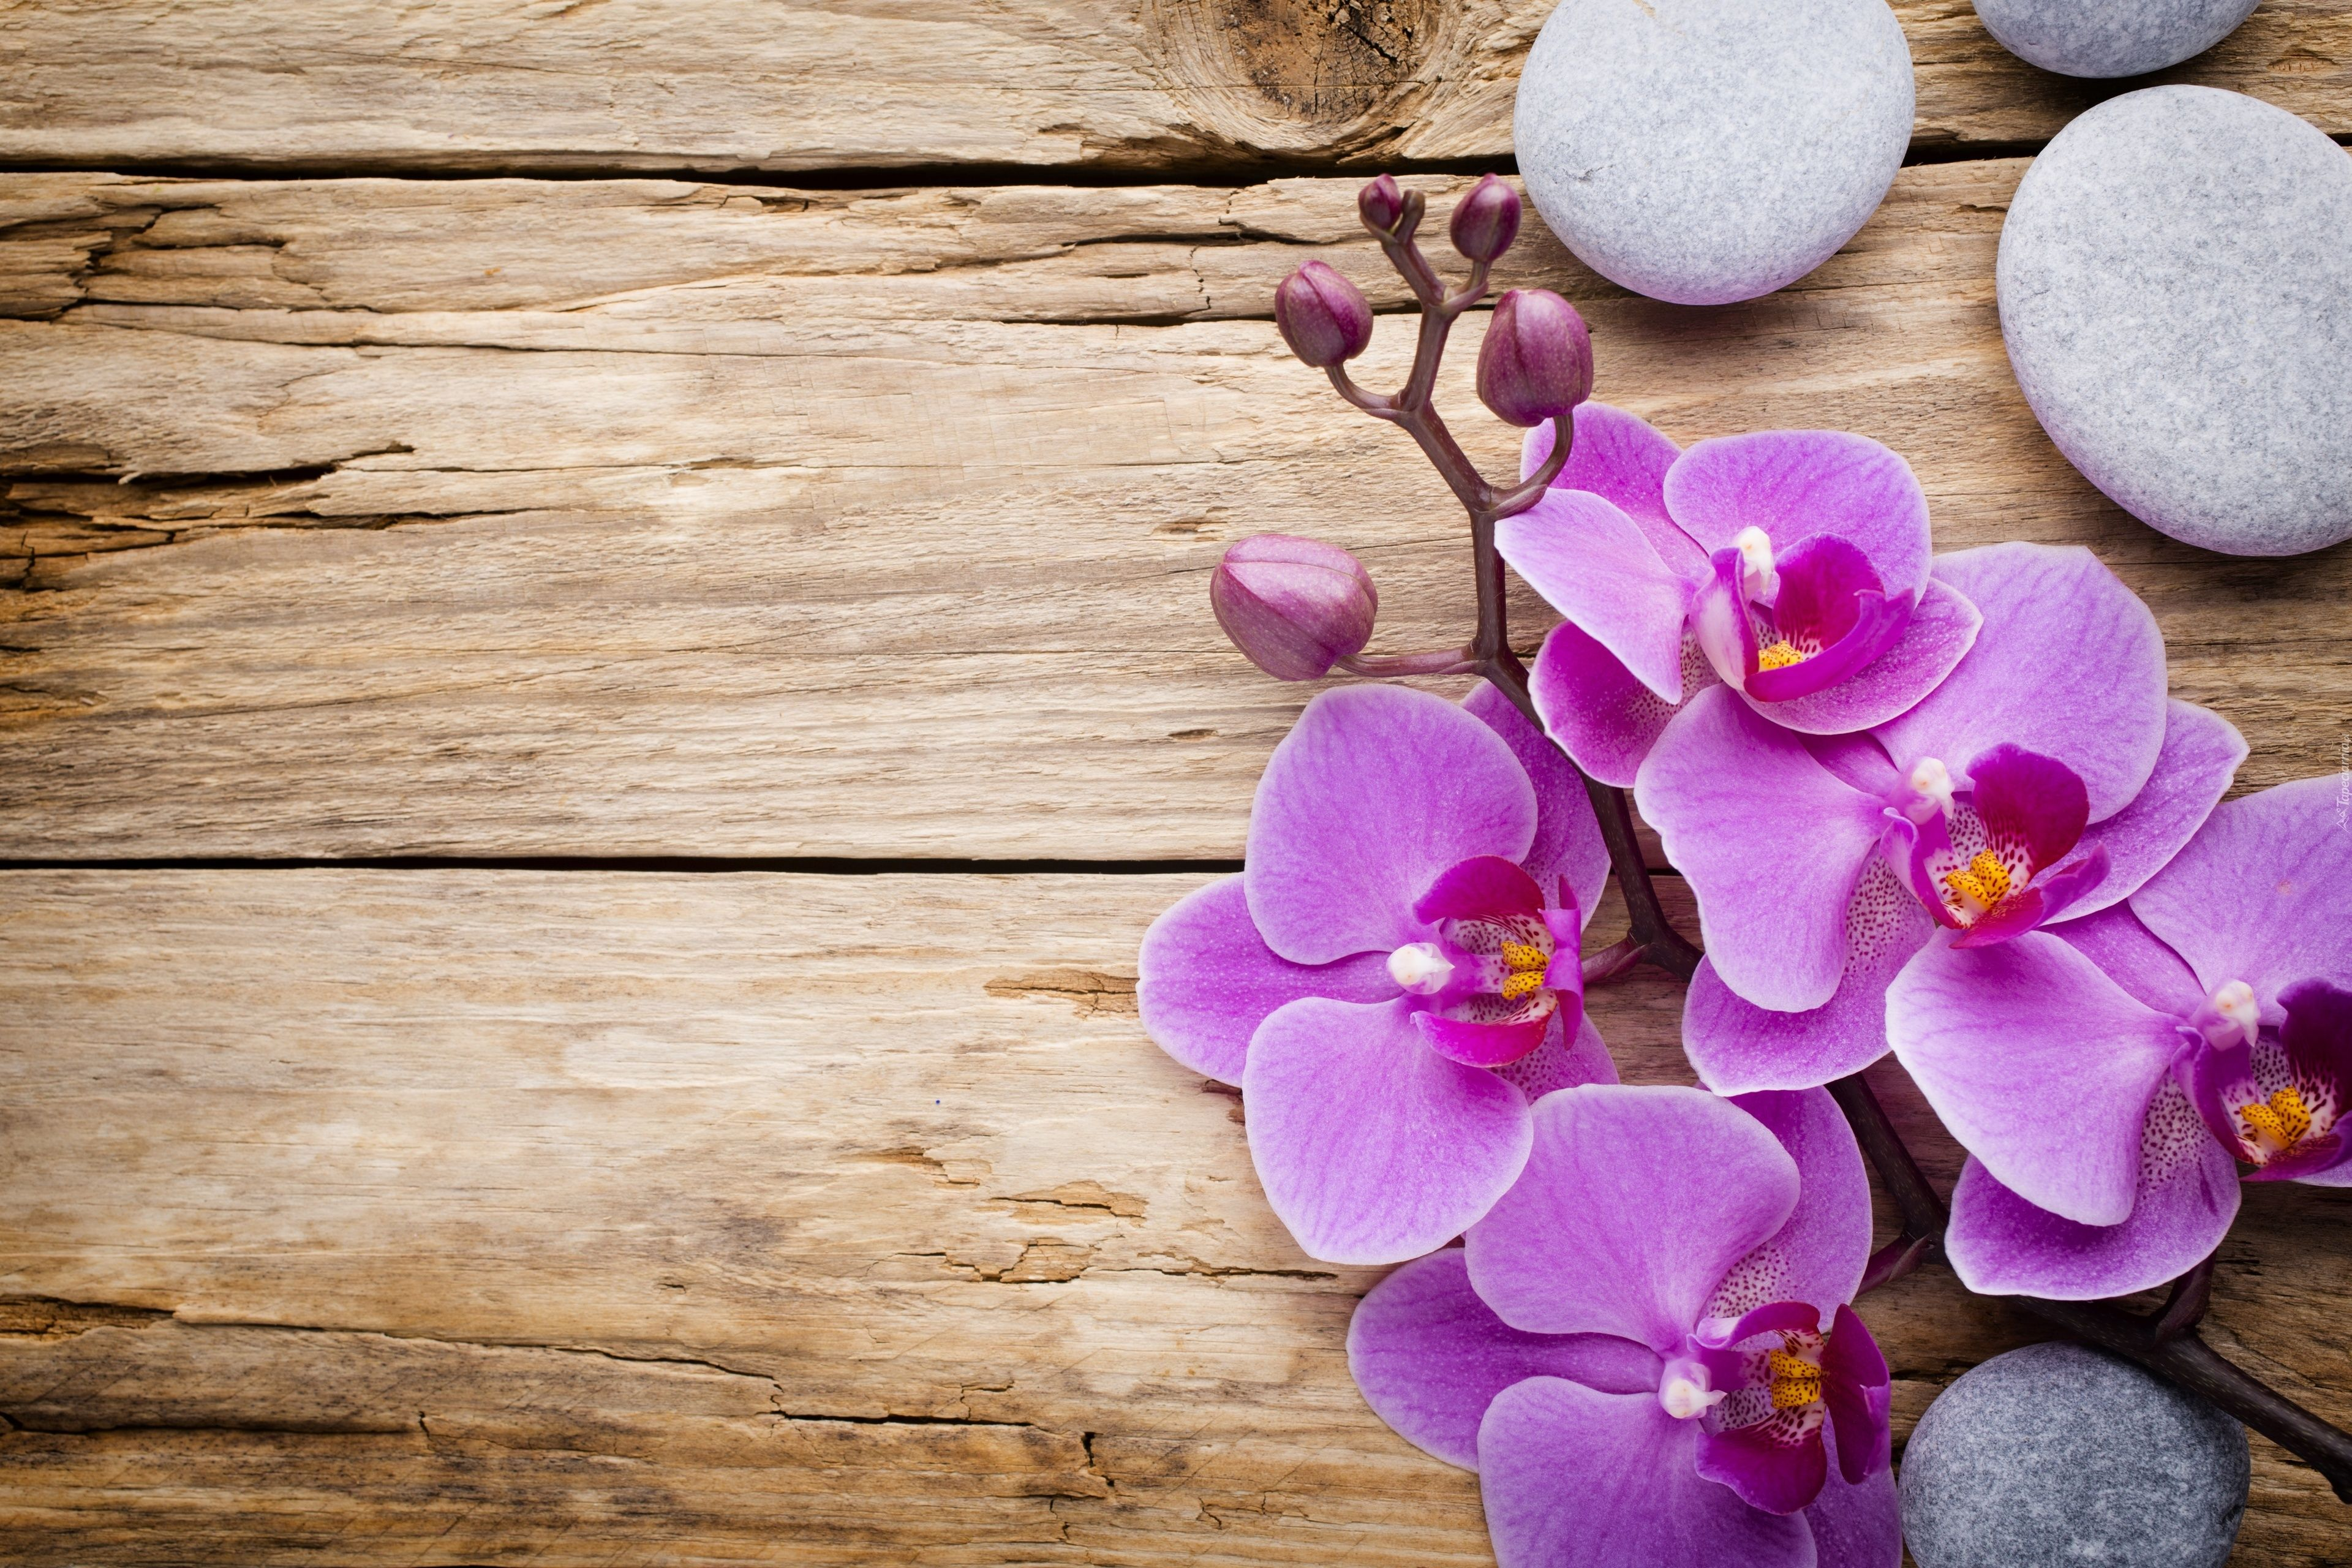 Storczyk Kamienie Deski Flower Backgrounds Flower Phone Wallpaper Orchid Illustration